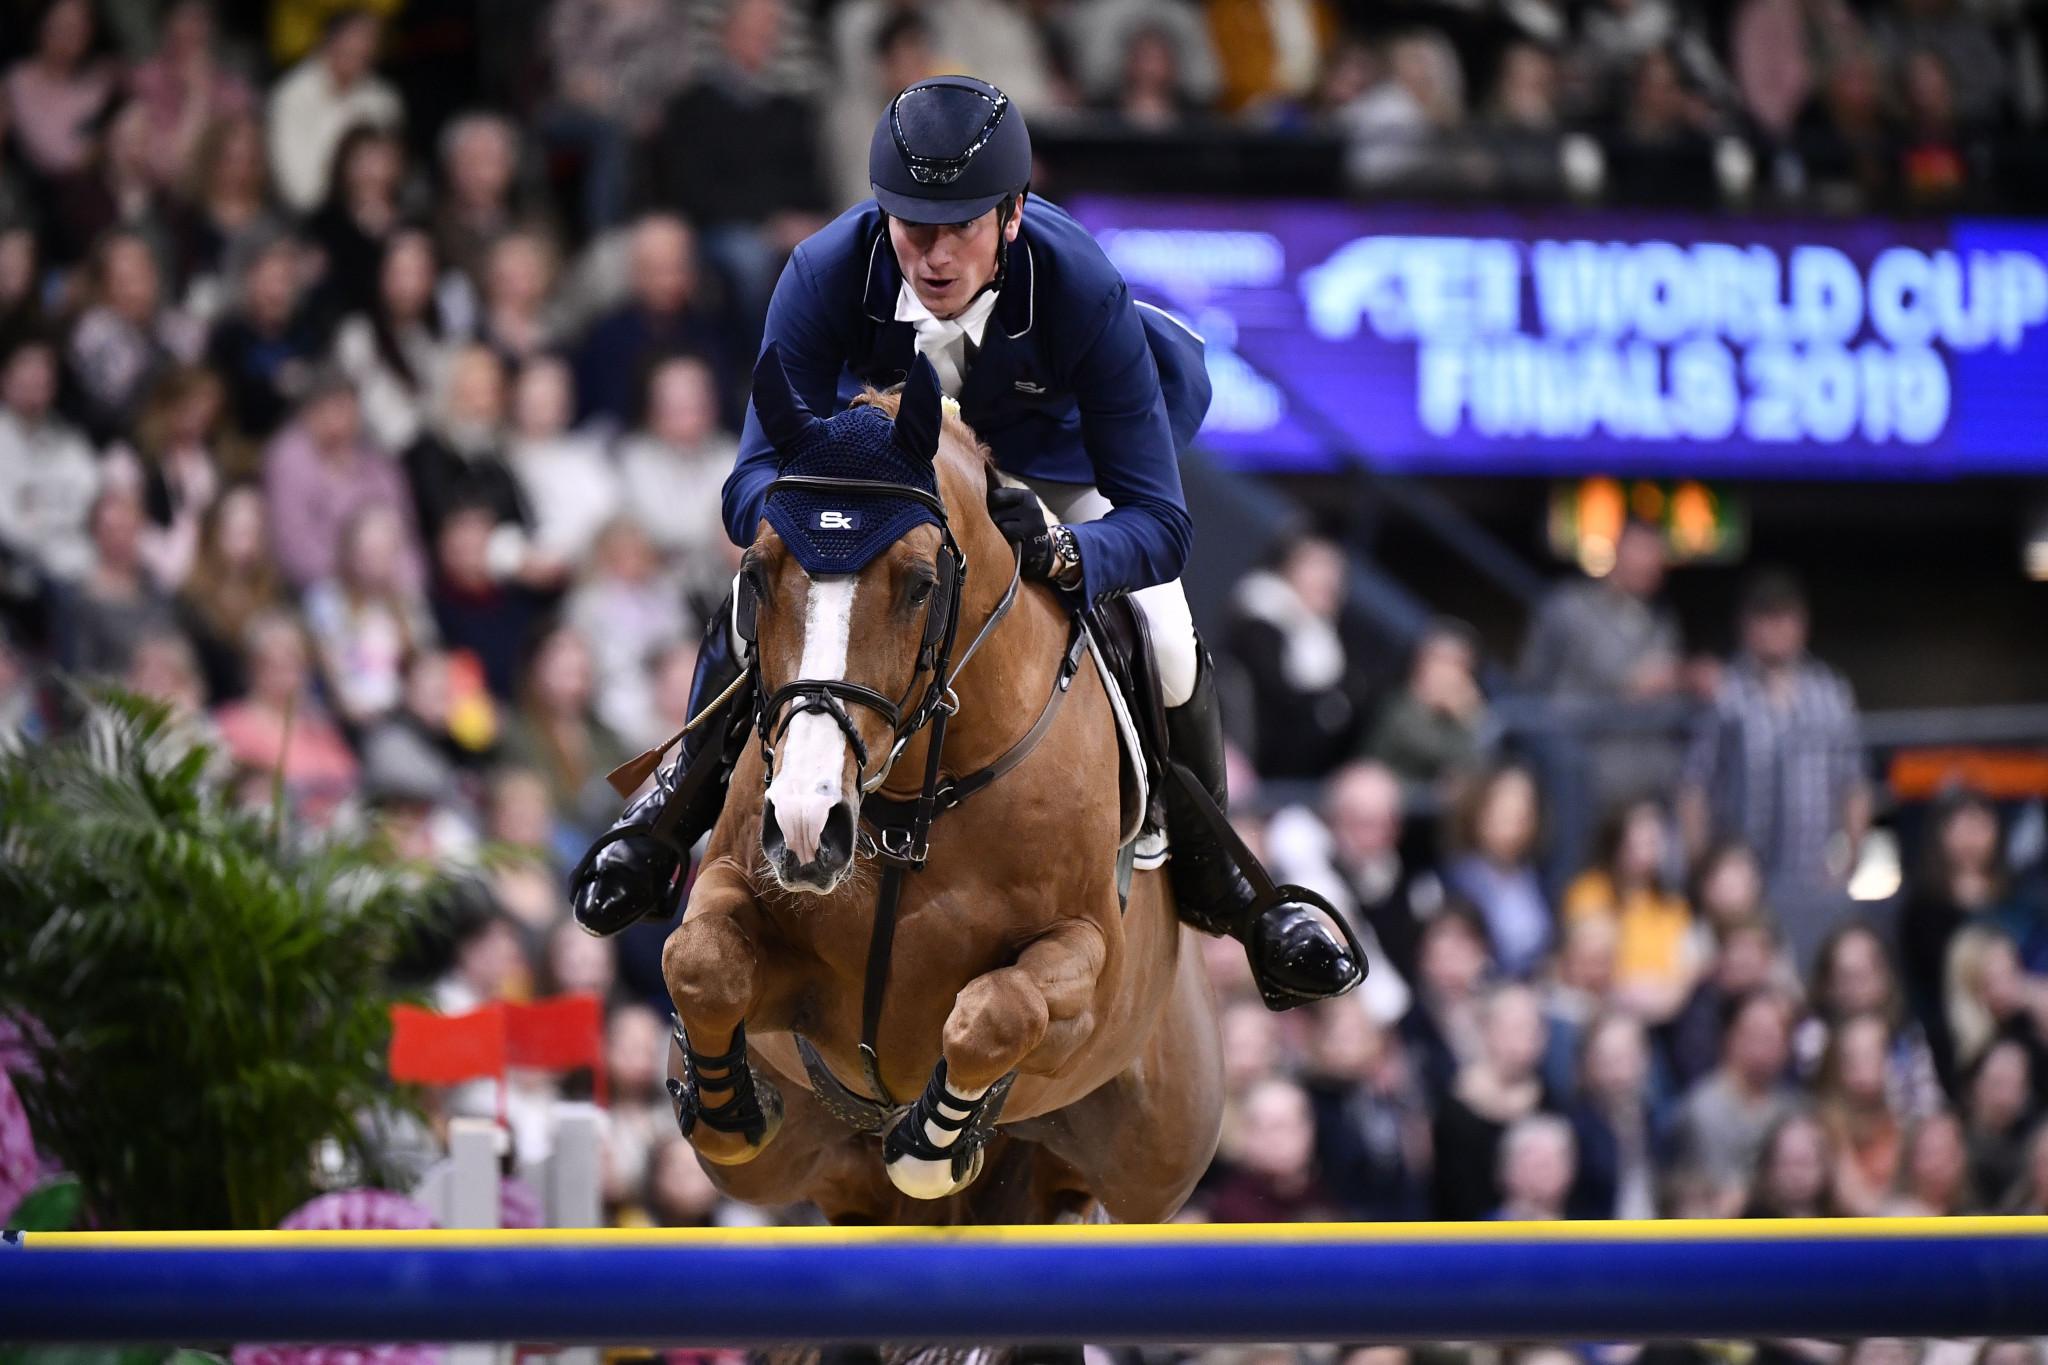 Home rider Deusser tastes victory at World Equestrian Festival in Aachen